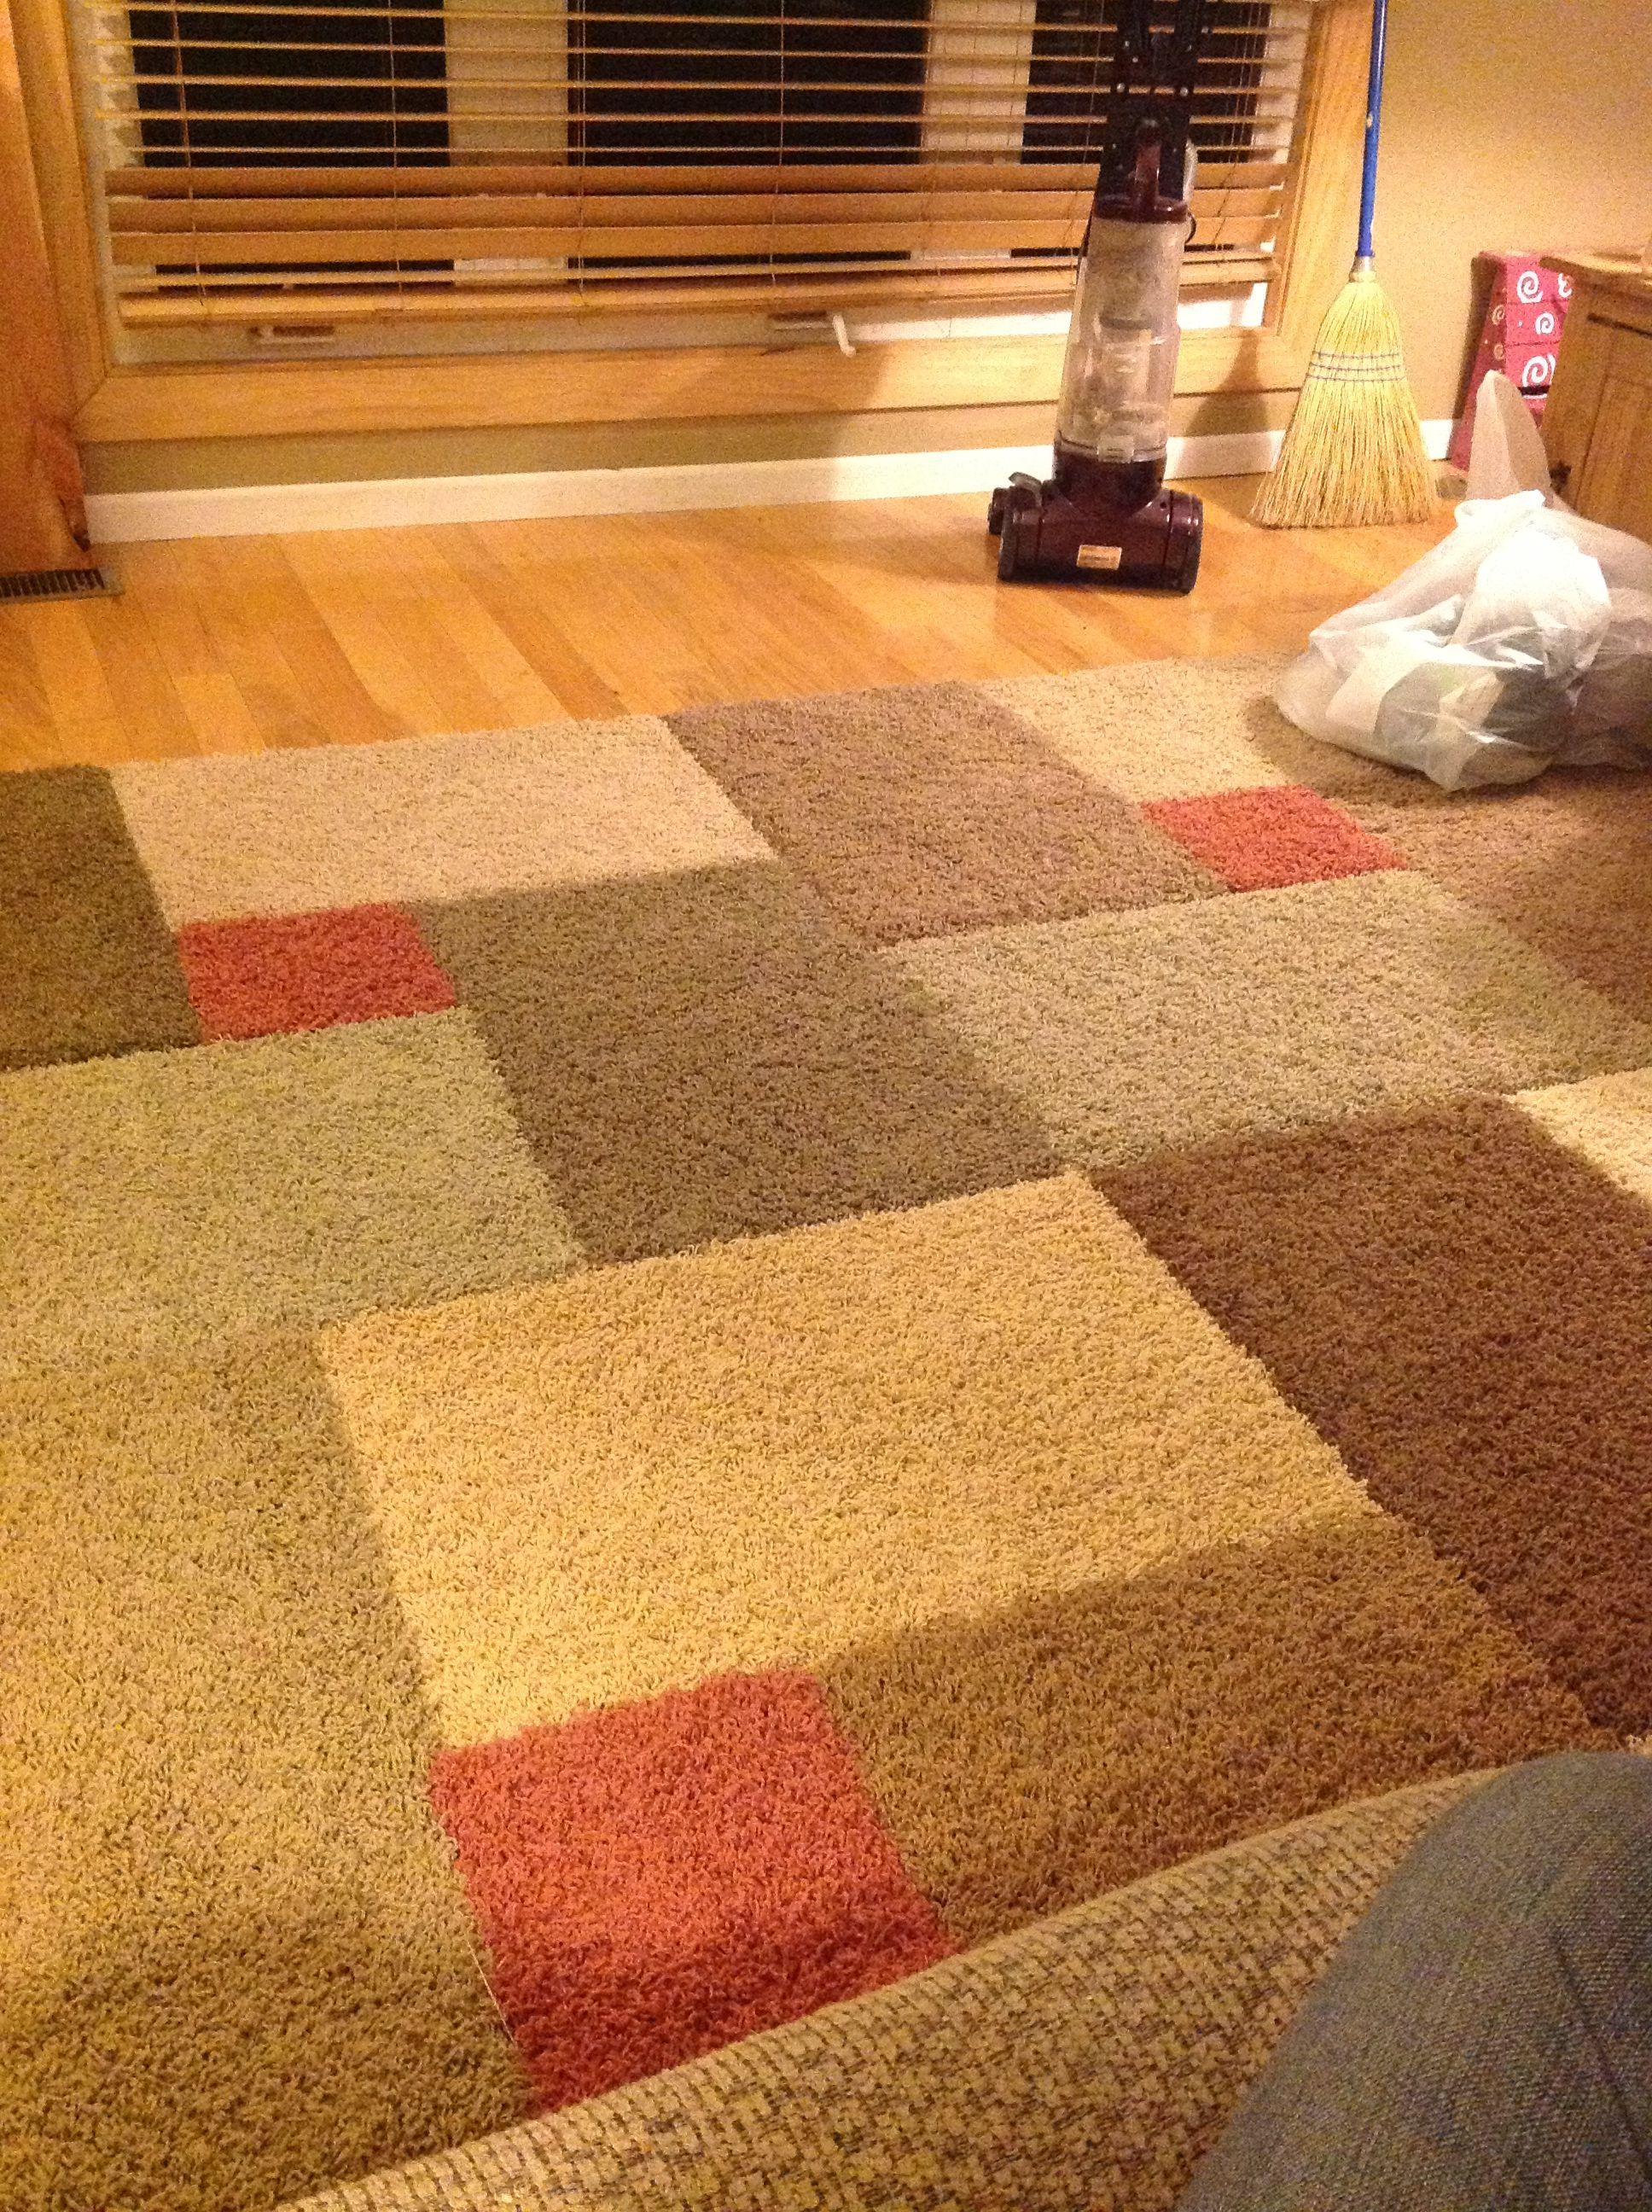 our $20 diy area rug! carpet samples+razor knife+carpet seam tape